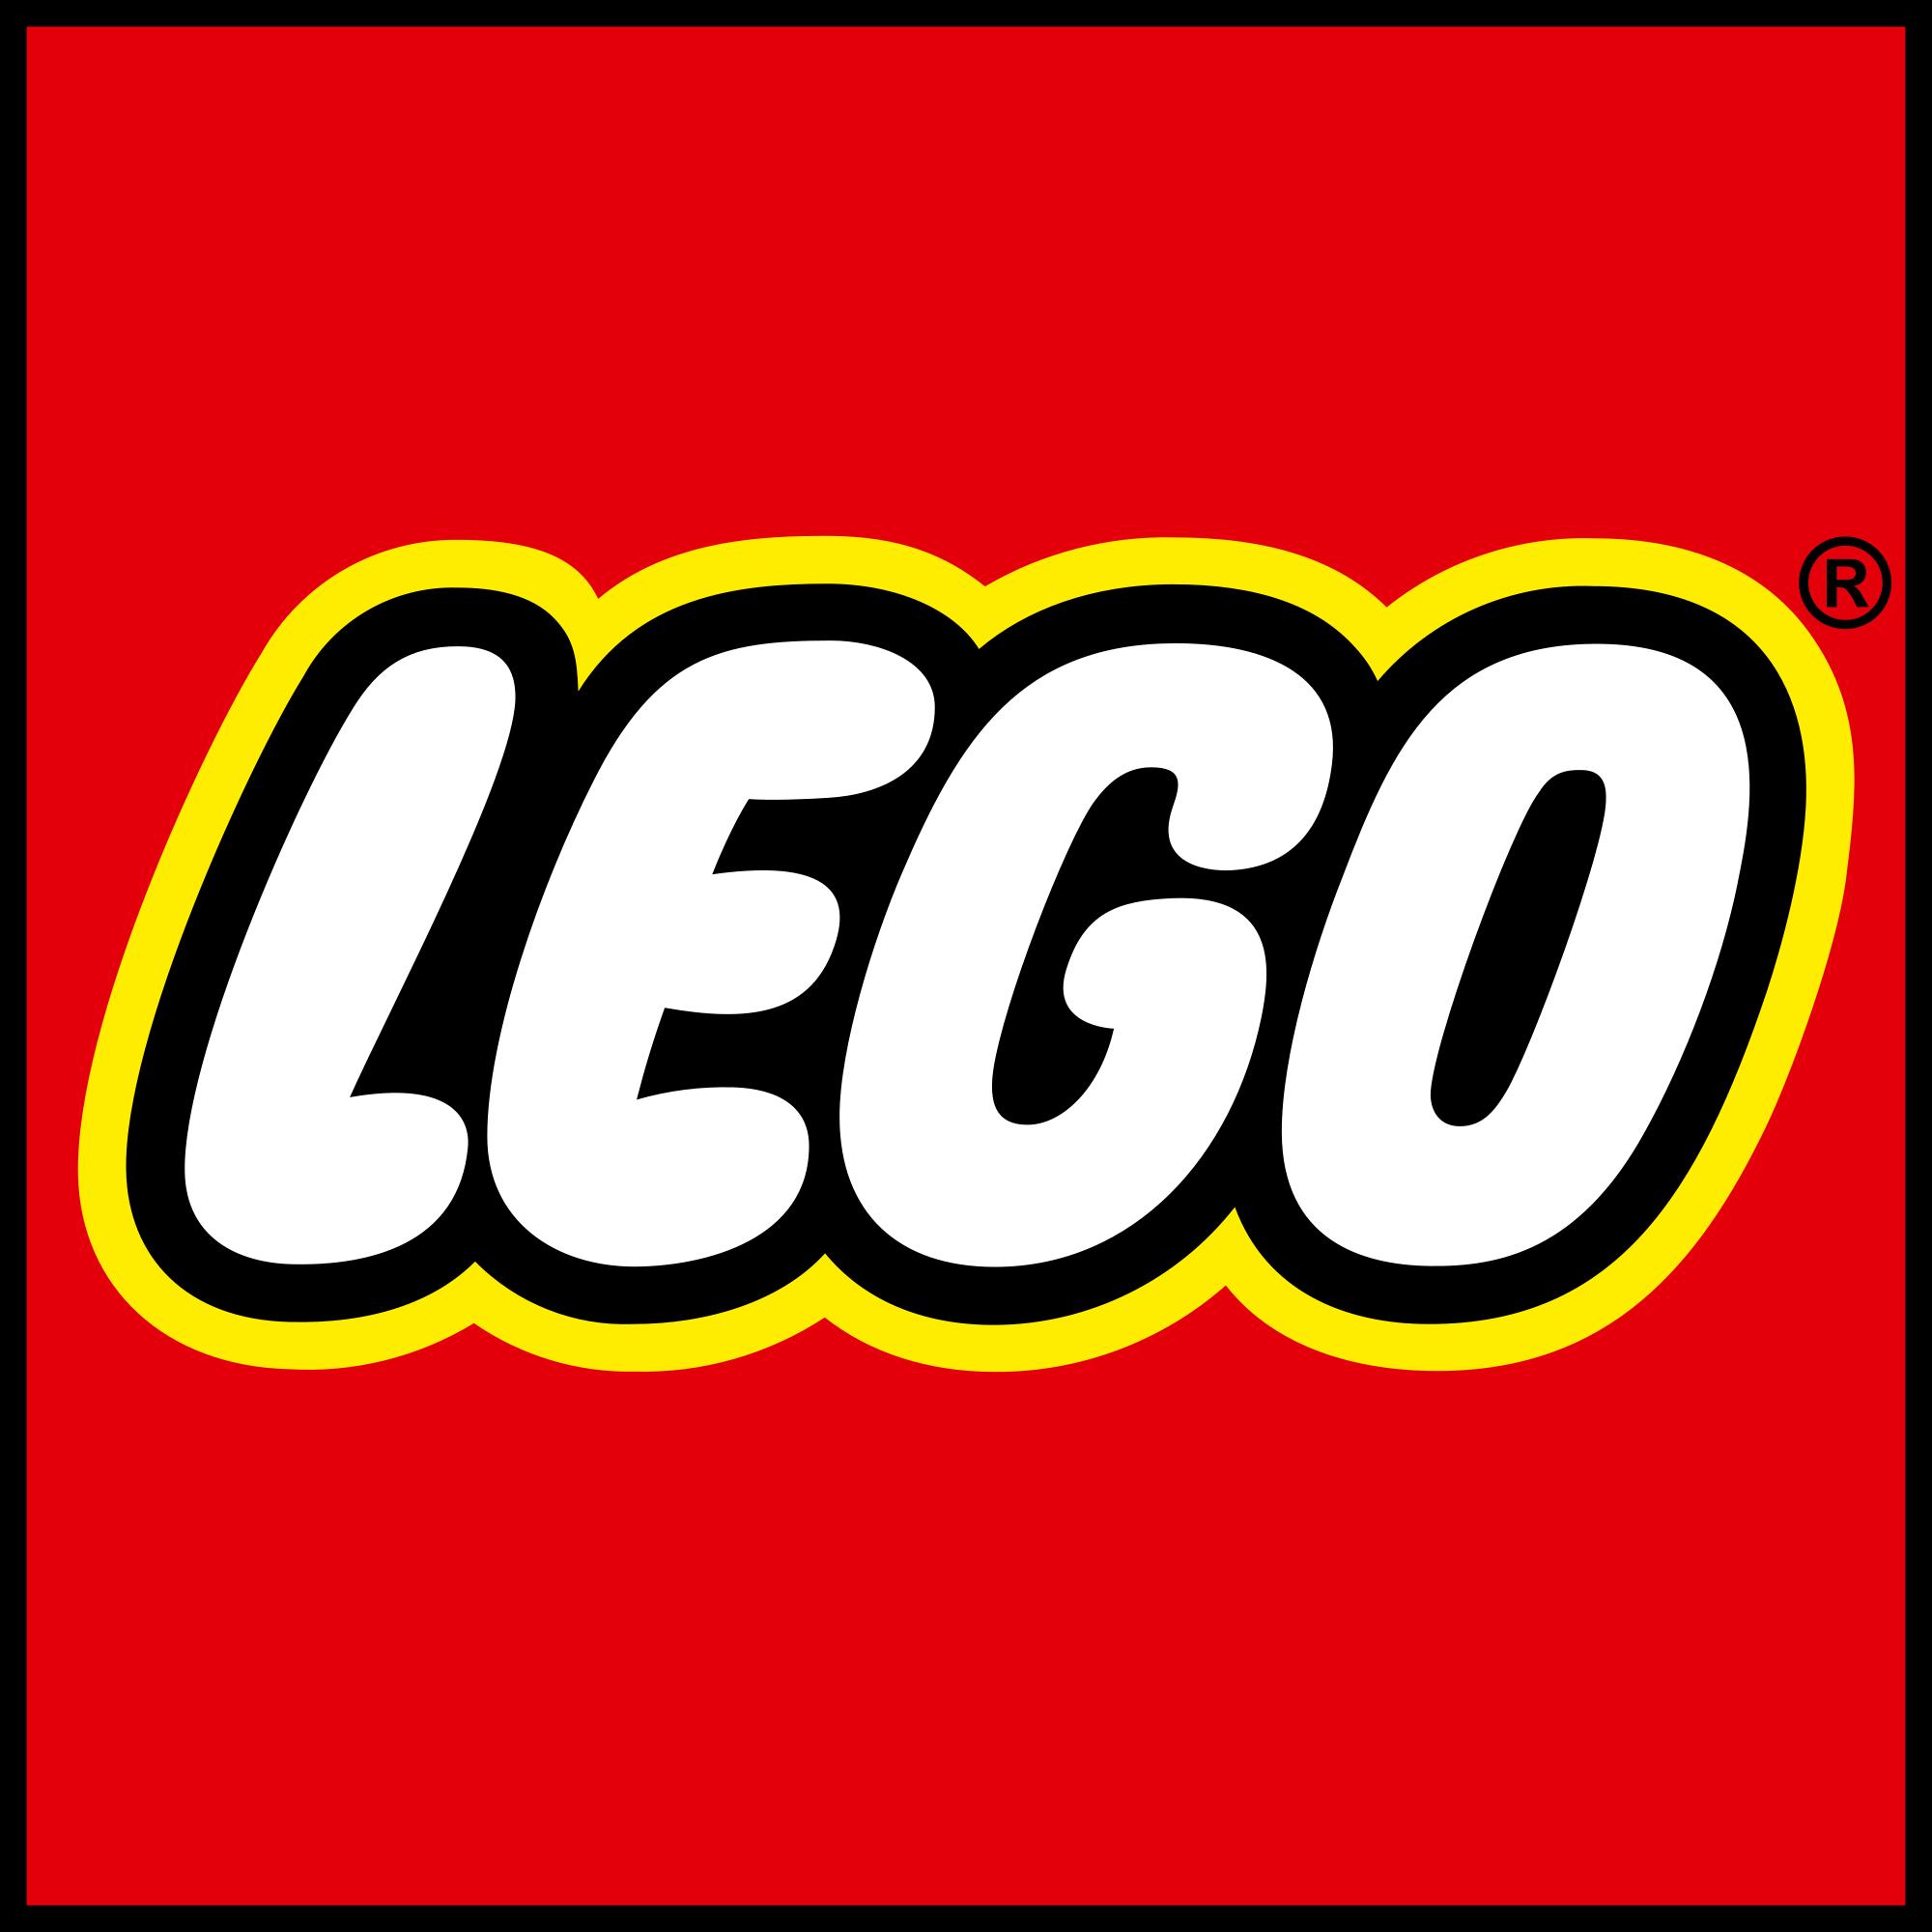 Diverse Lego Technic Sets bei Amazon reduziert